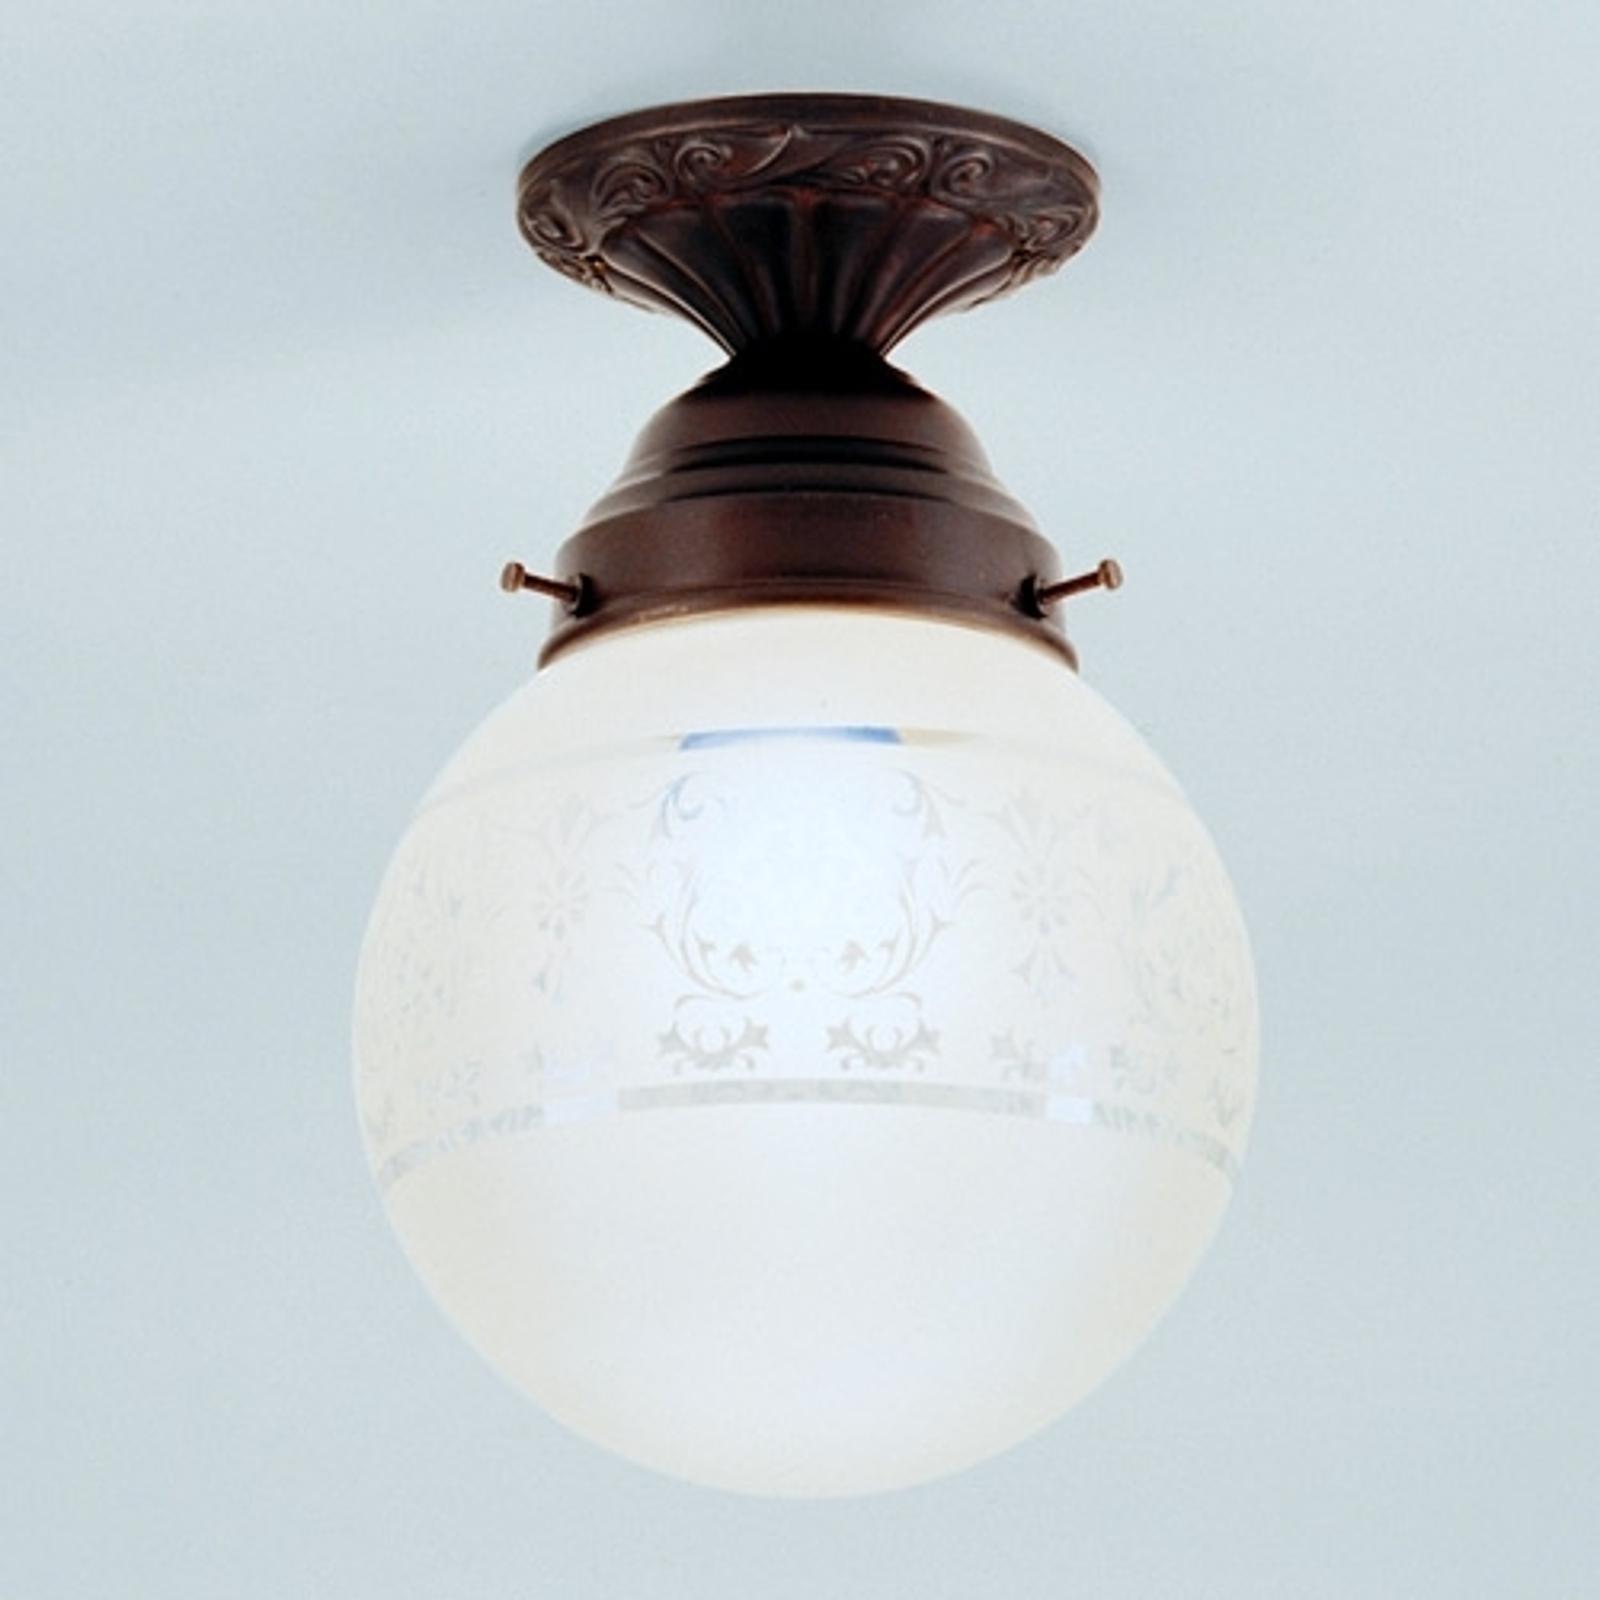 Lampa sufitowa Jack - made in Germany